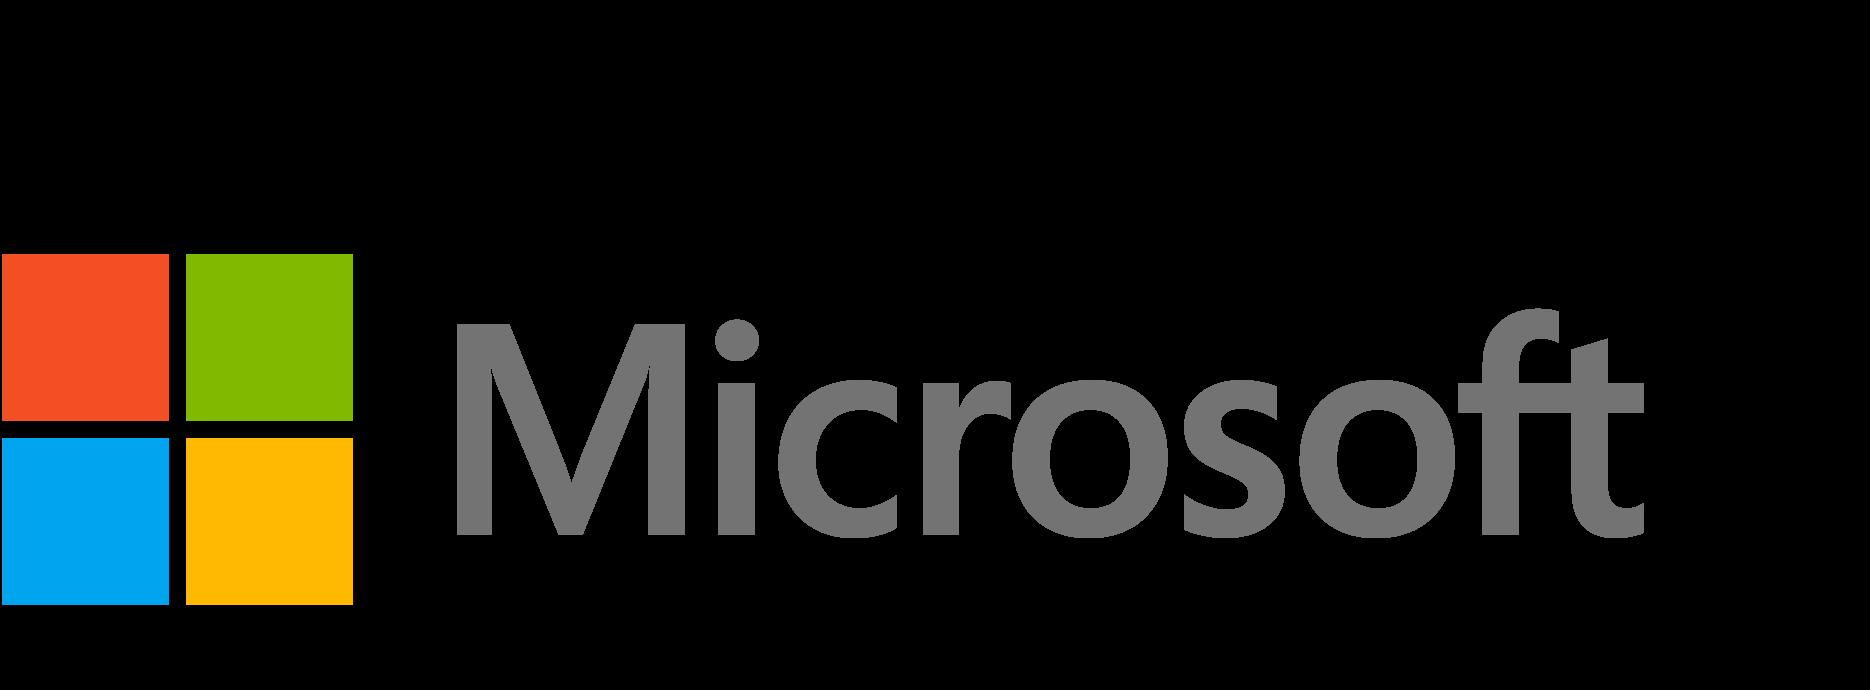 Microsoft Dynamics 365 for Sales